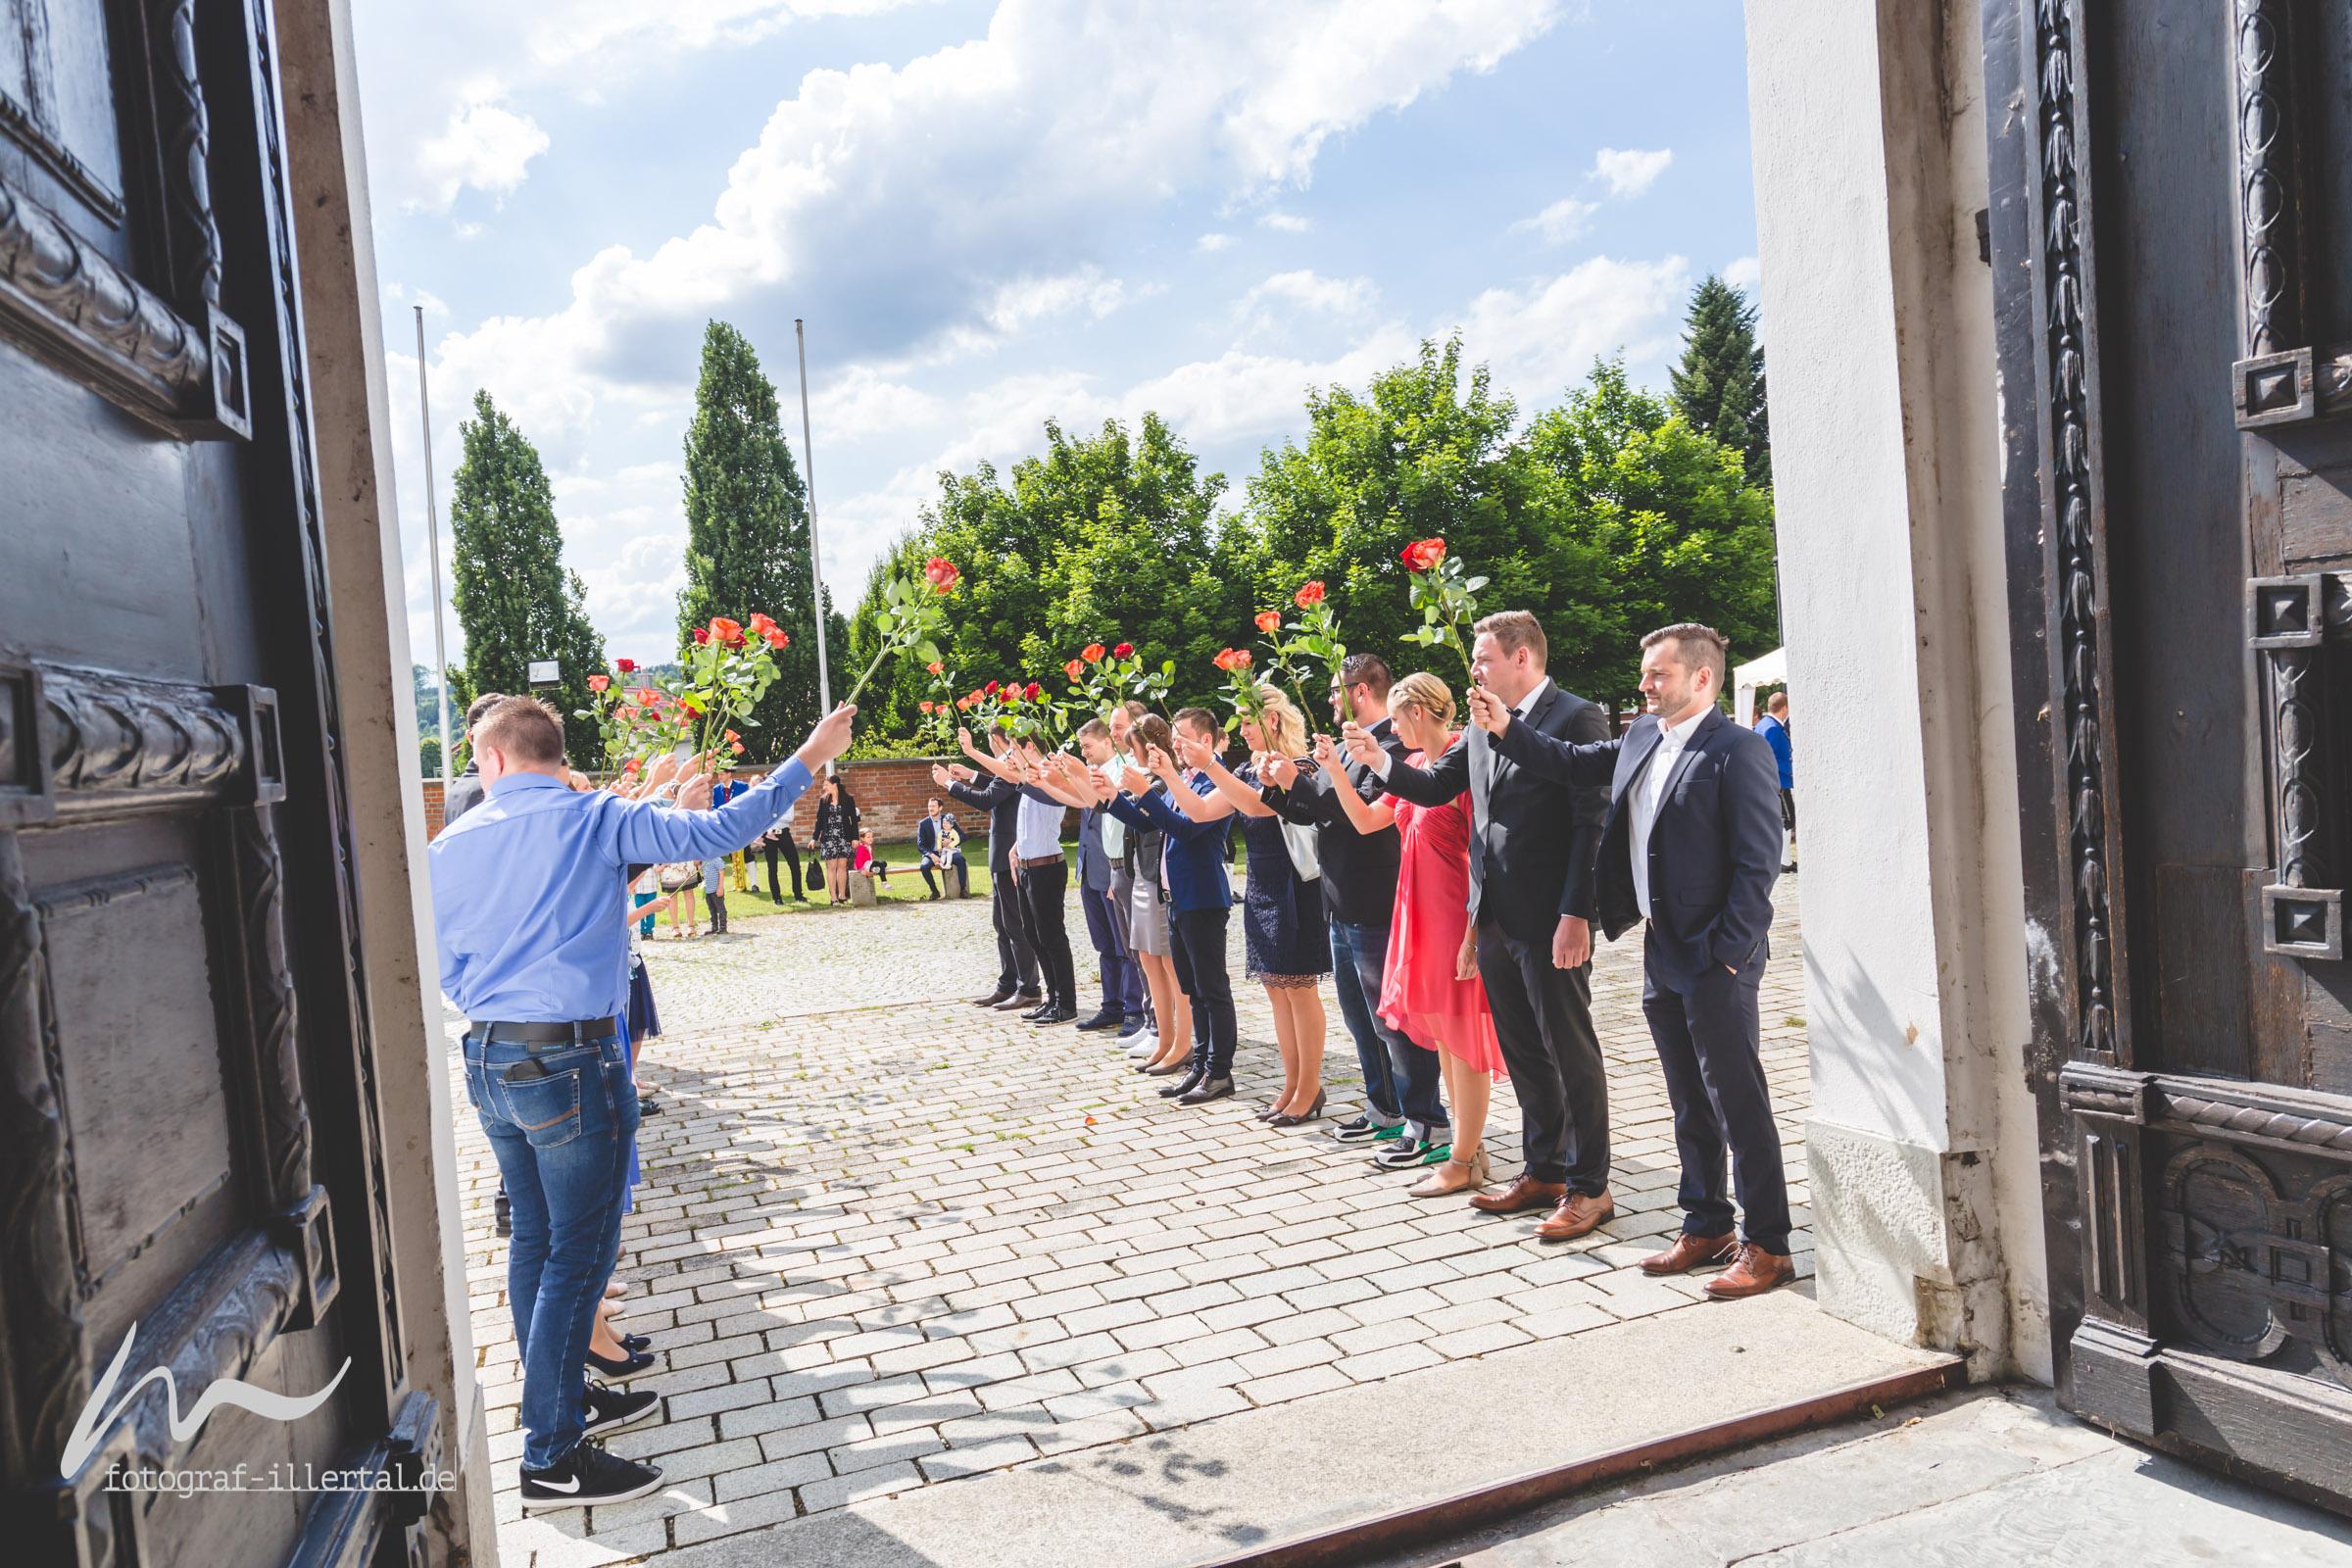 Fotograf Illertal-Christian Miller-Hochzeitsfotografie-_MG_4467